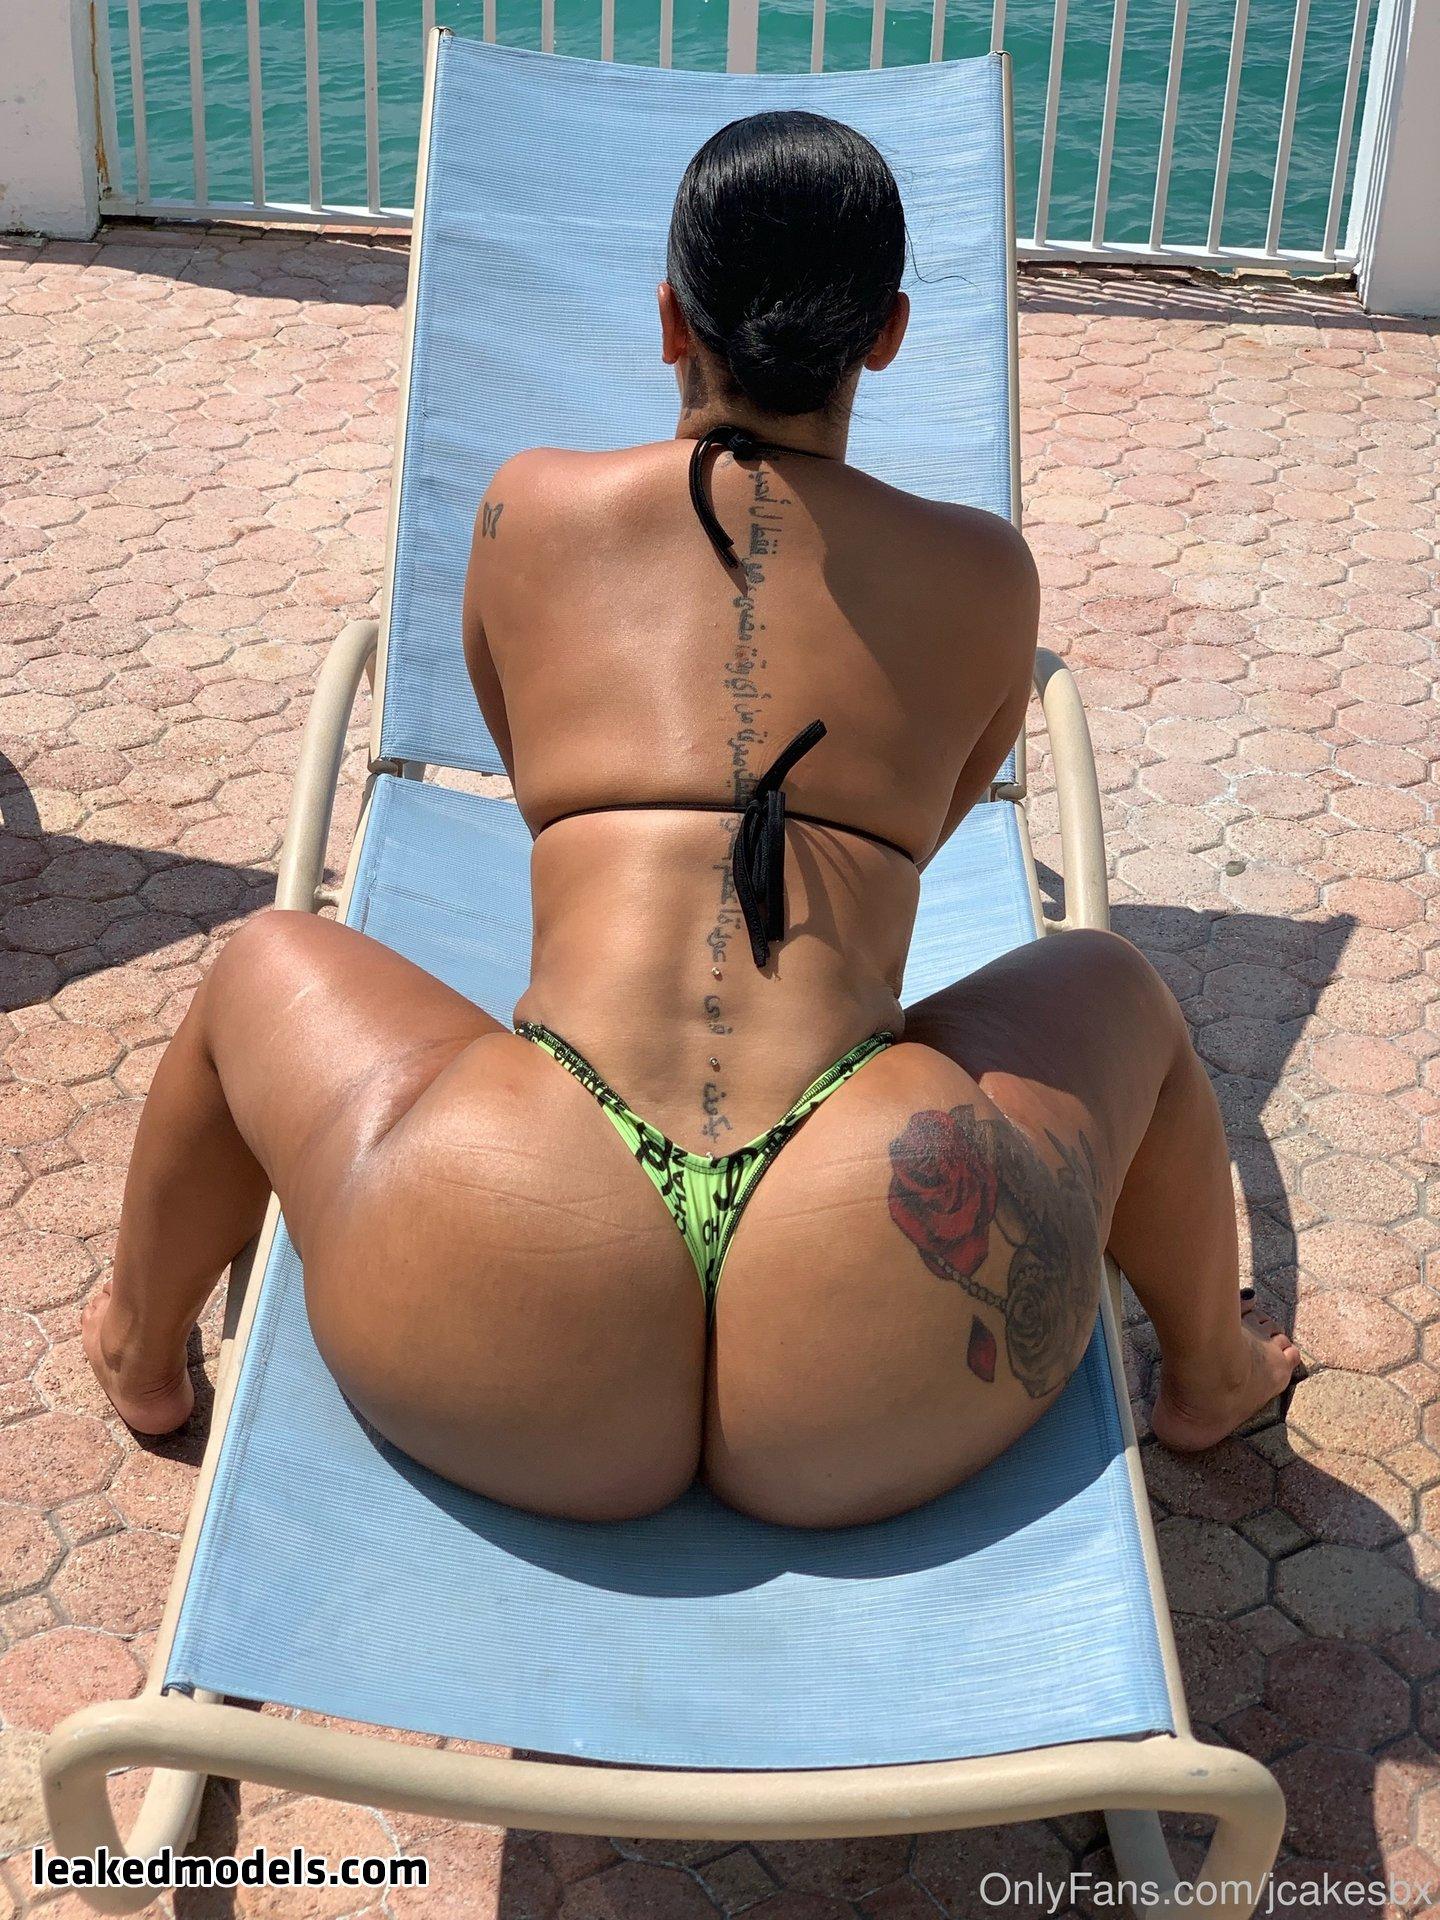 jcakesbx – jcakesbxxx OnlyFans Sexy Leaks (39 Photos)